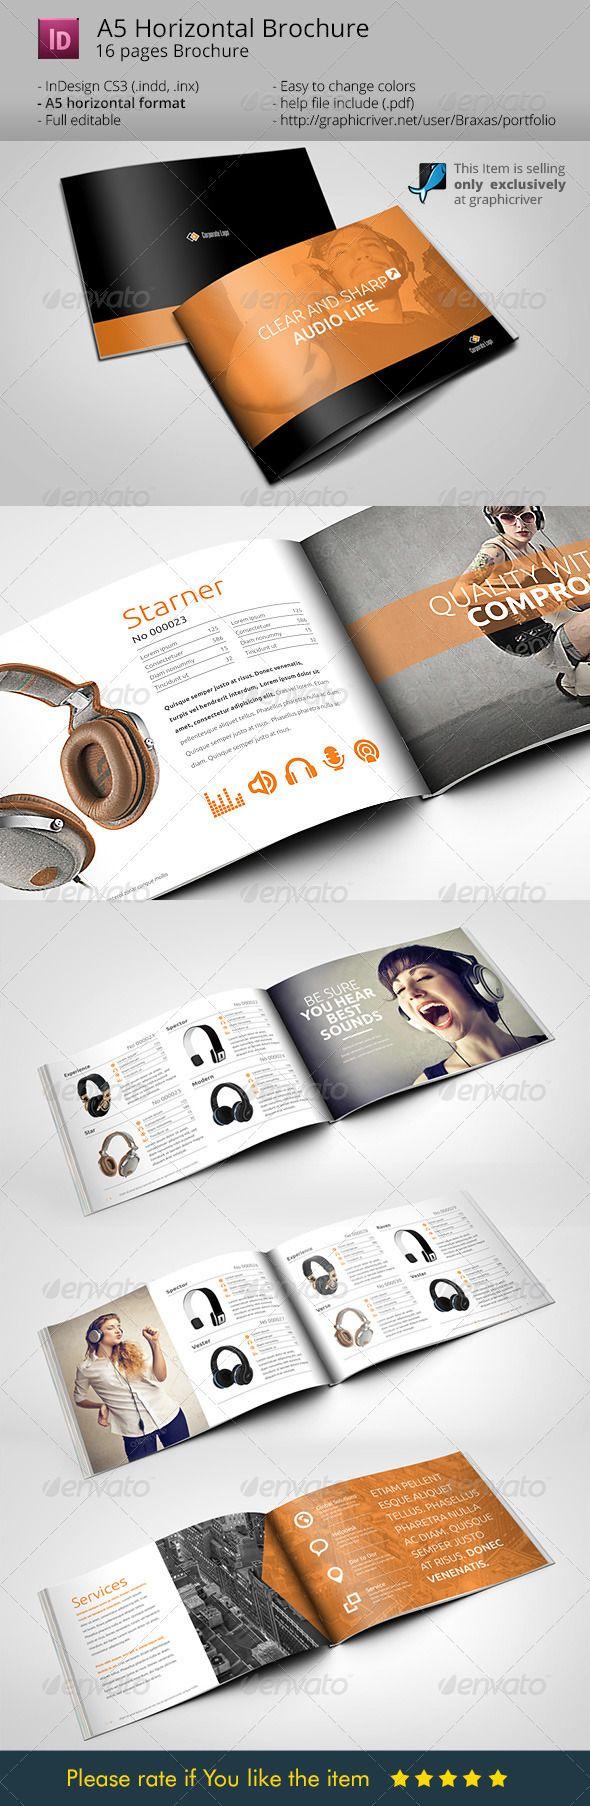 Horizontal Brochure A5 Audio Life   Audio, Catálogo y Folletos